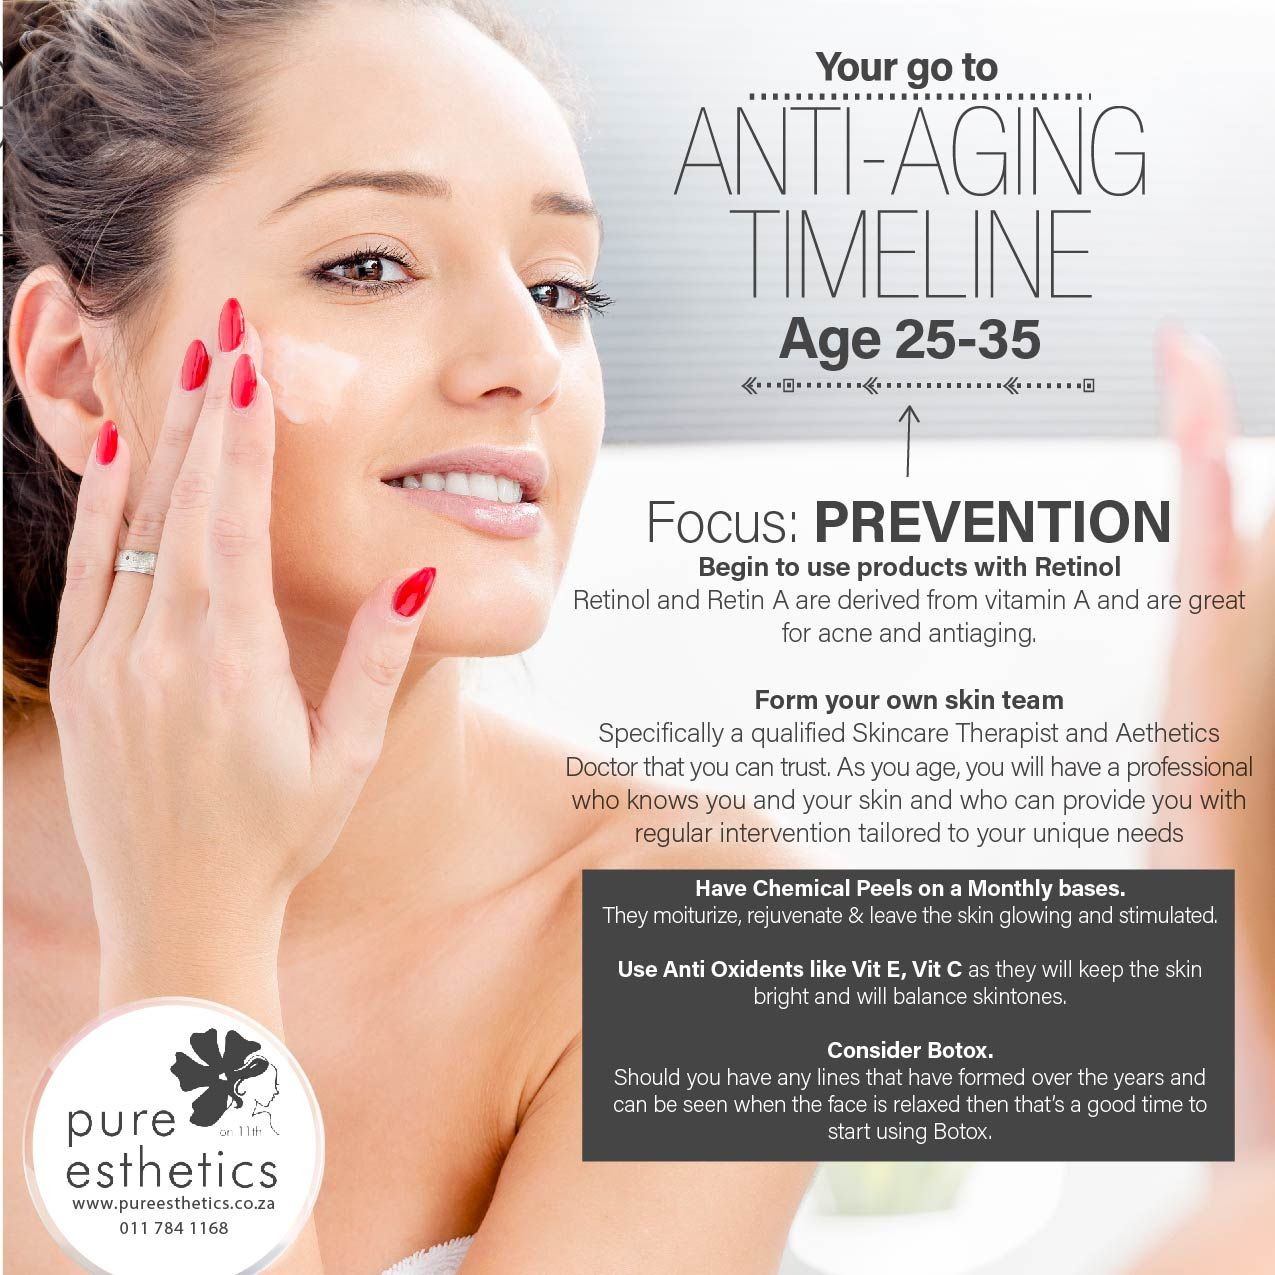 Ages 25 35 Focus Prevention Beauty Skin Skinhealth Healthyaging Pureestheticssandton Skin Treatments Skin Skin Health